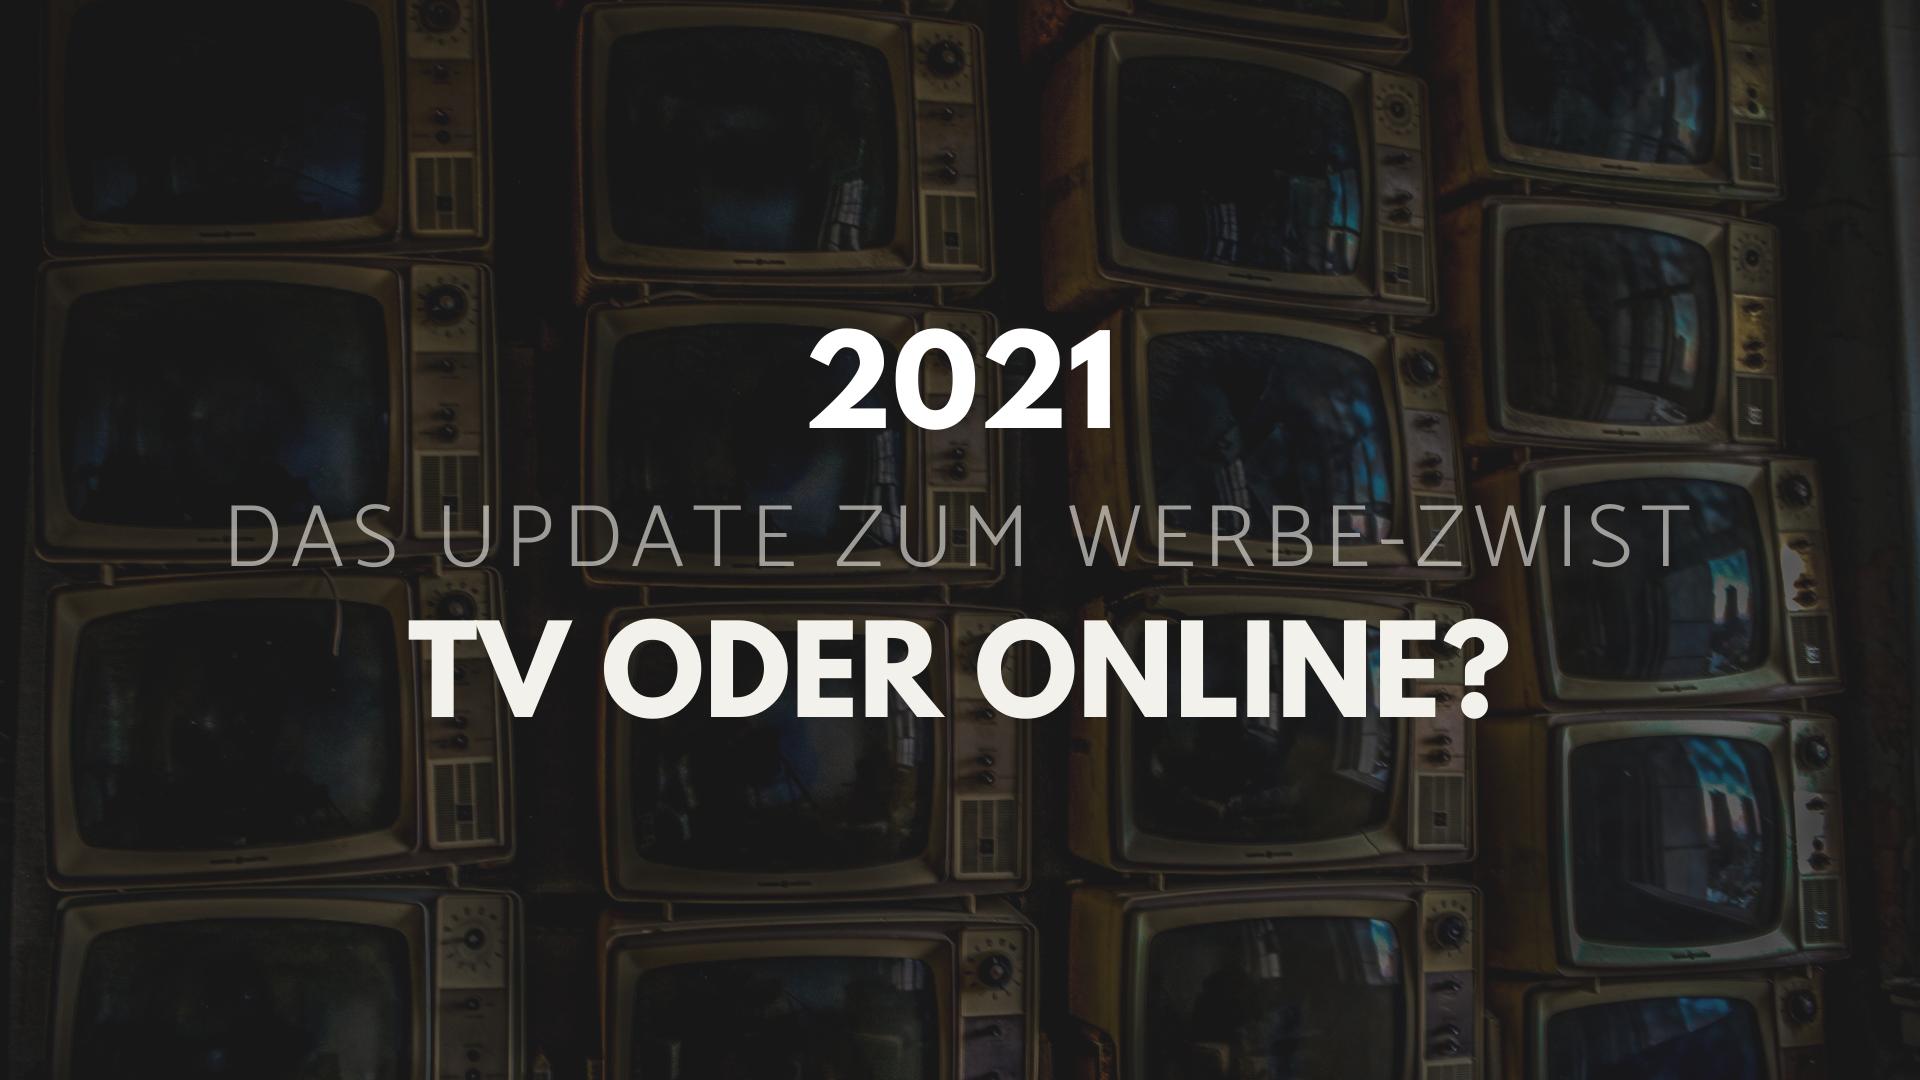 TV oder Online 2021